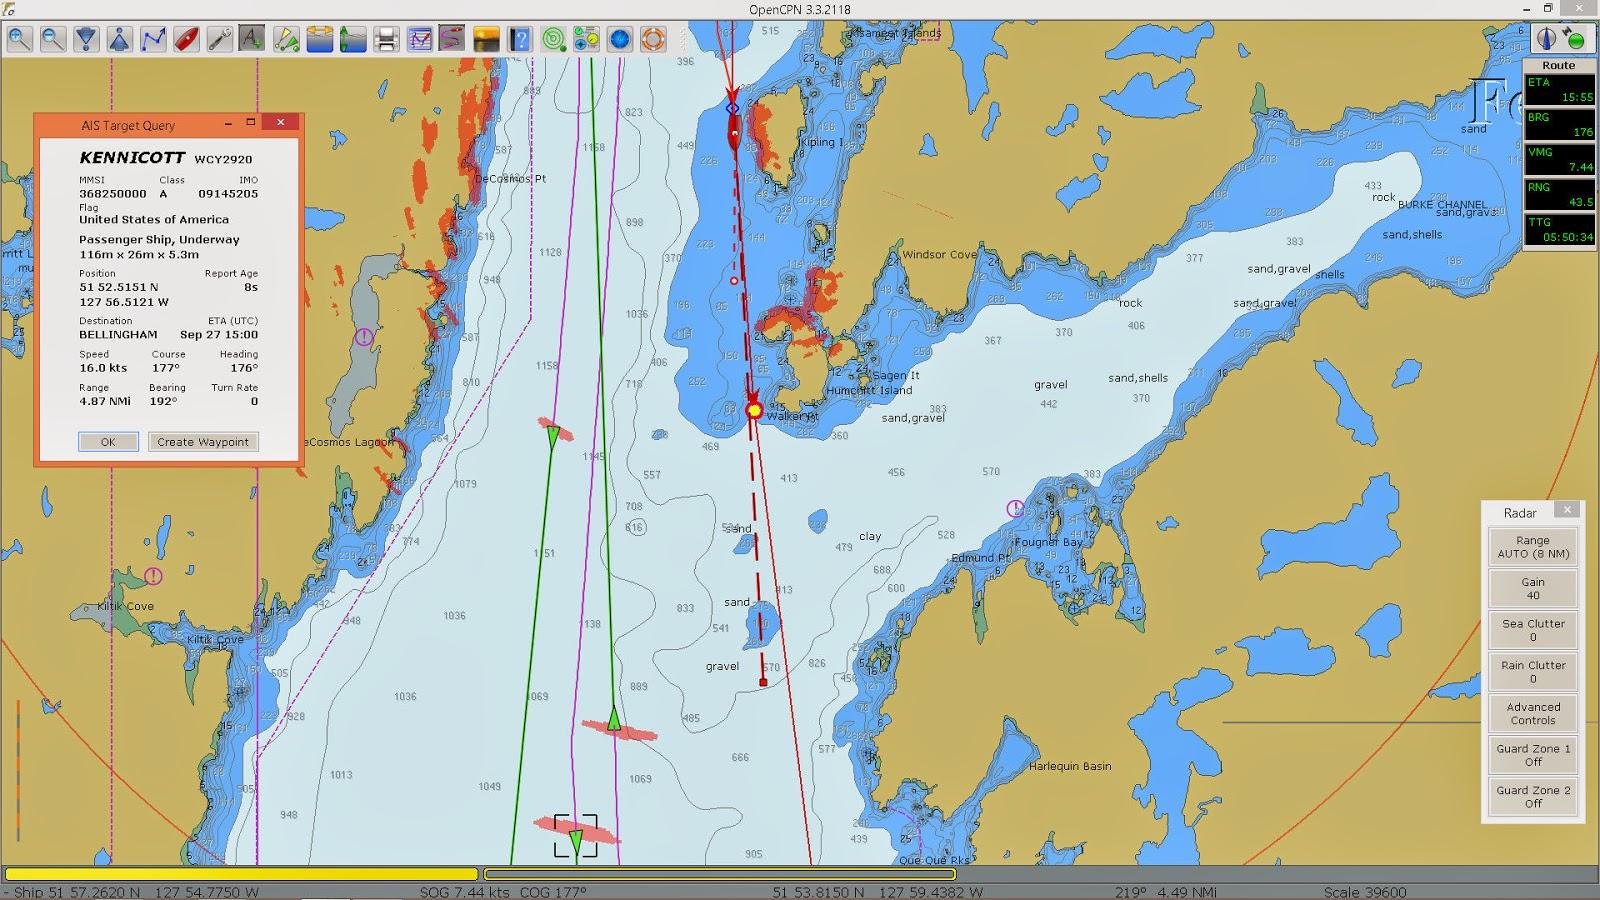 Sailing Adventures of David & Kathy: OpenCPN Radar overlay